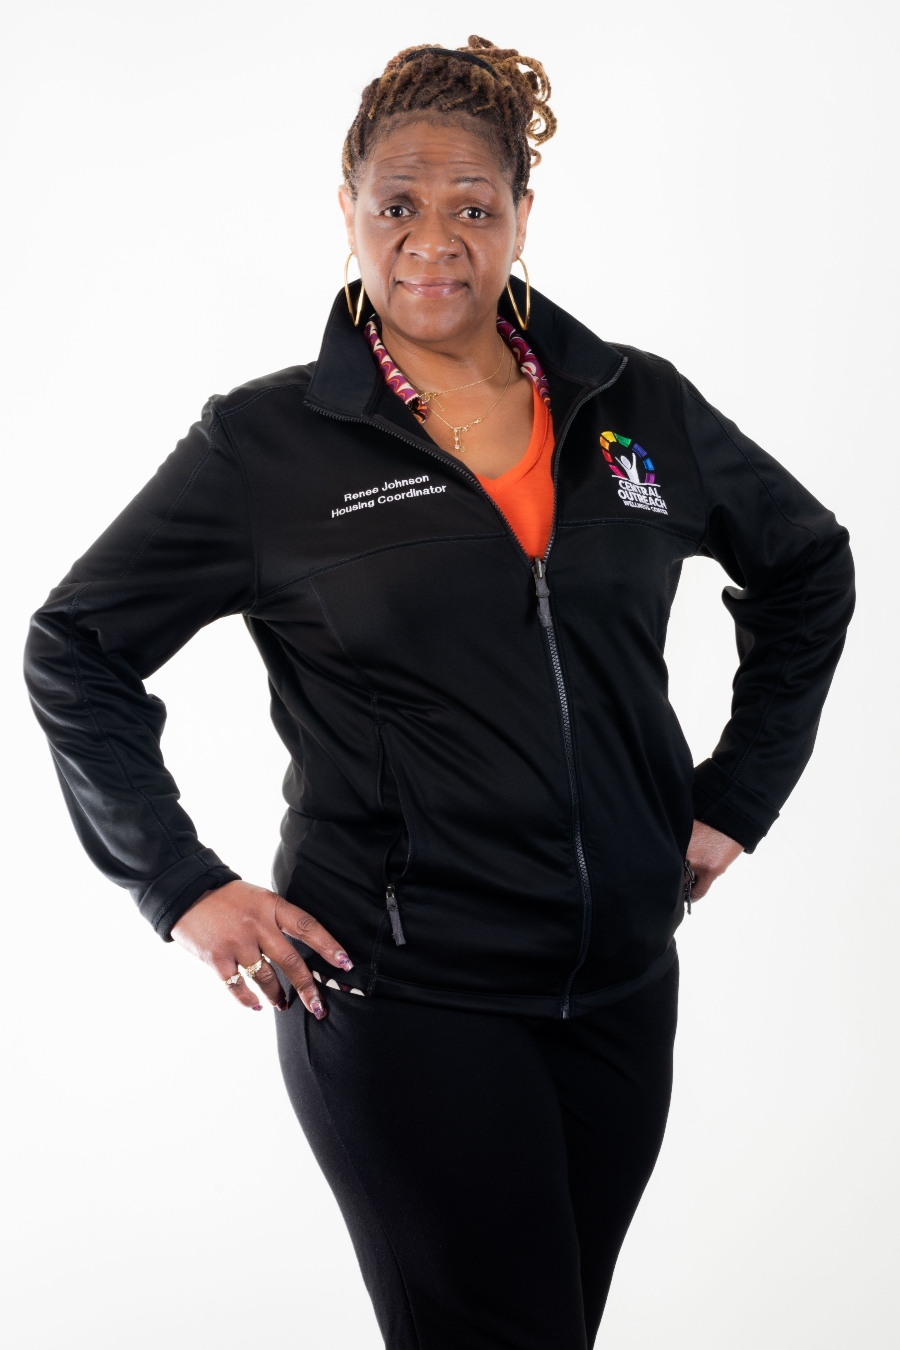 Central Outreach Renee Johnson